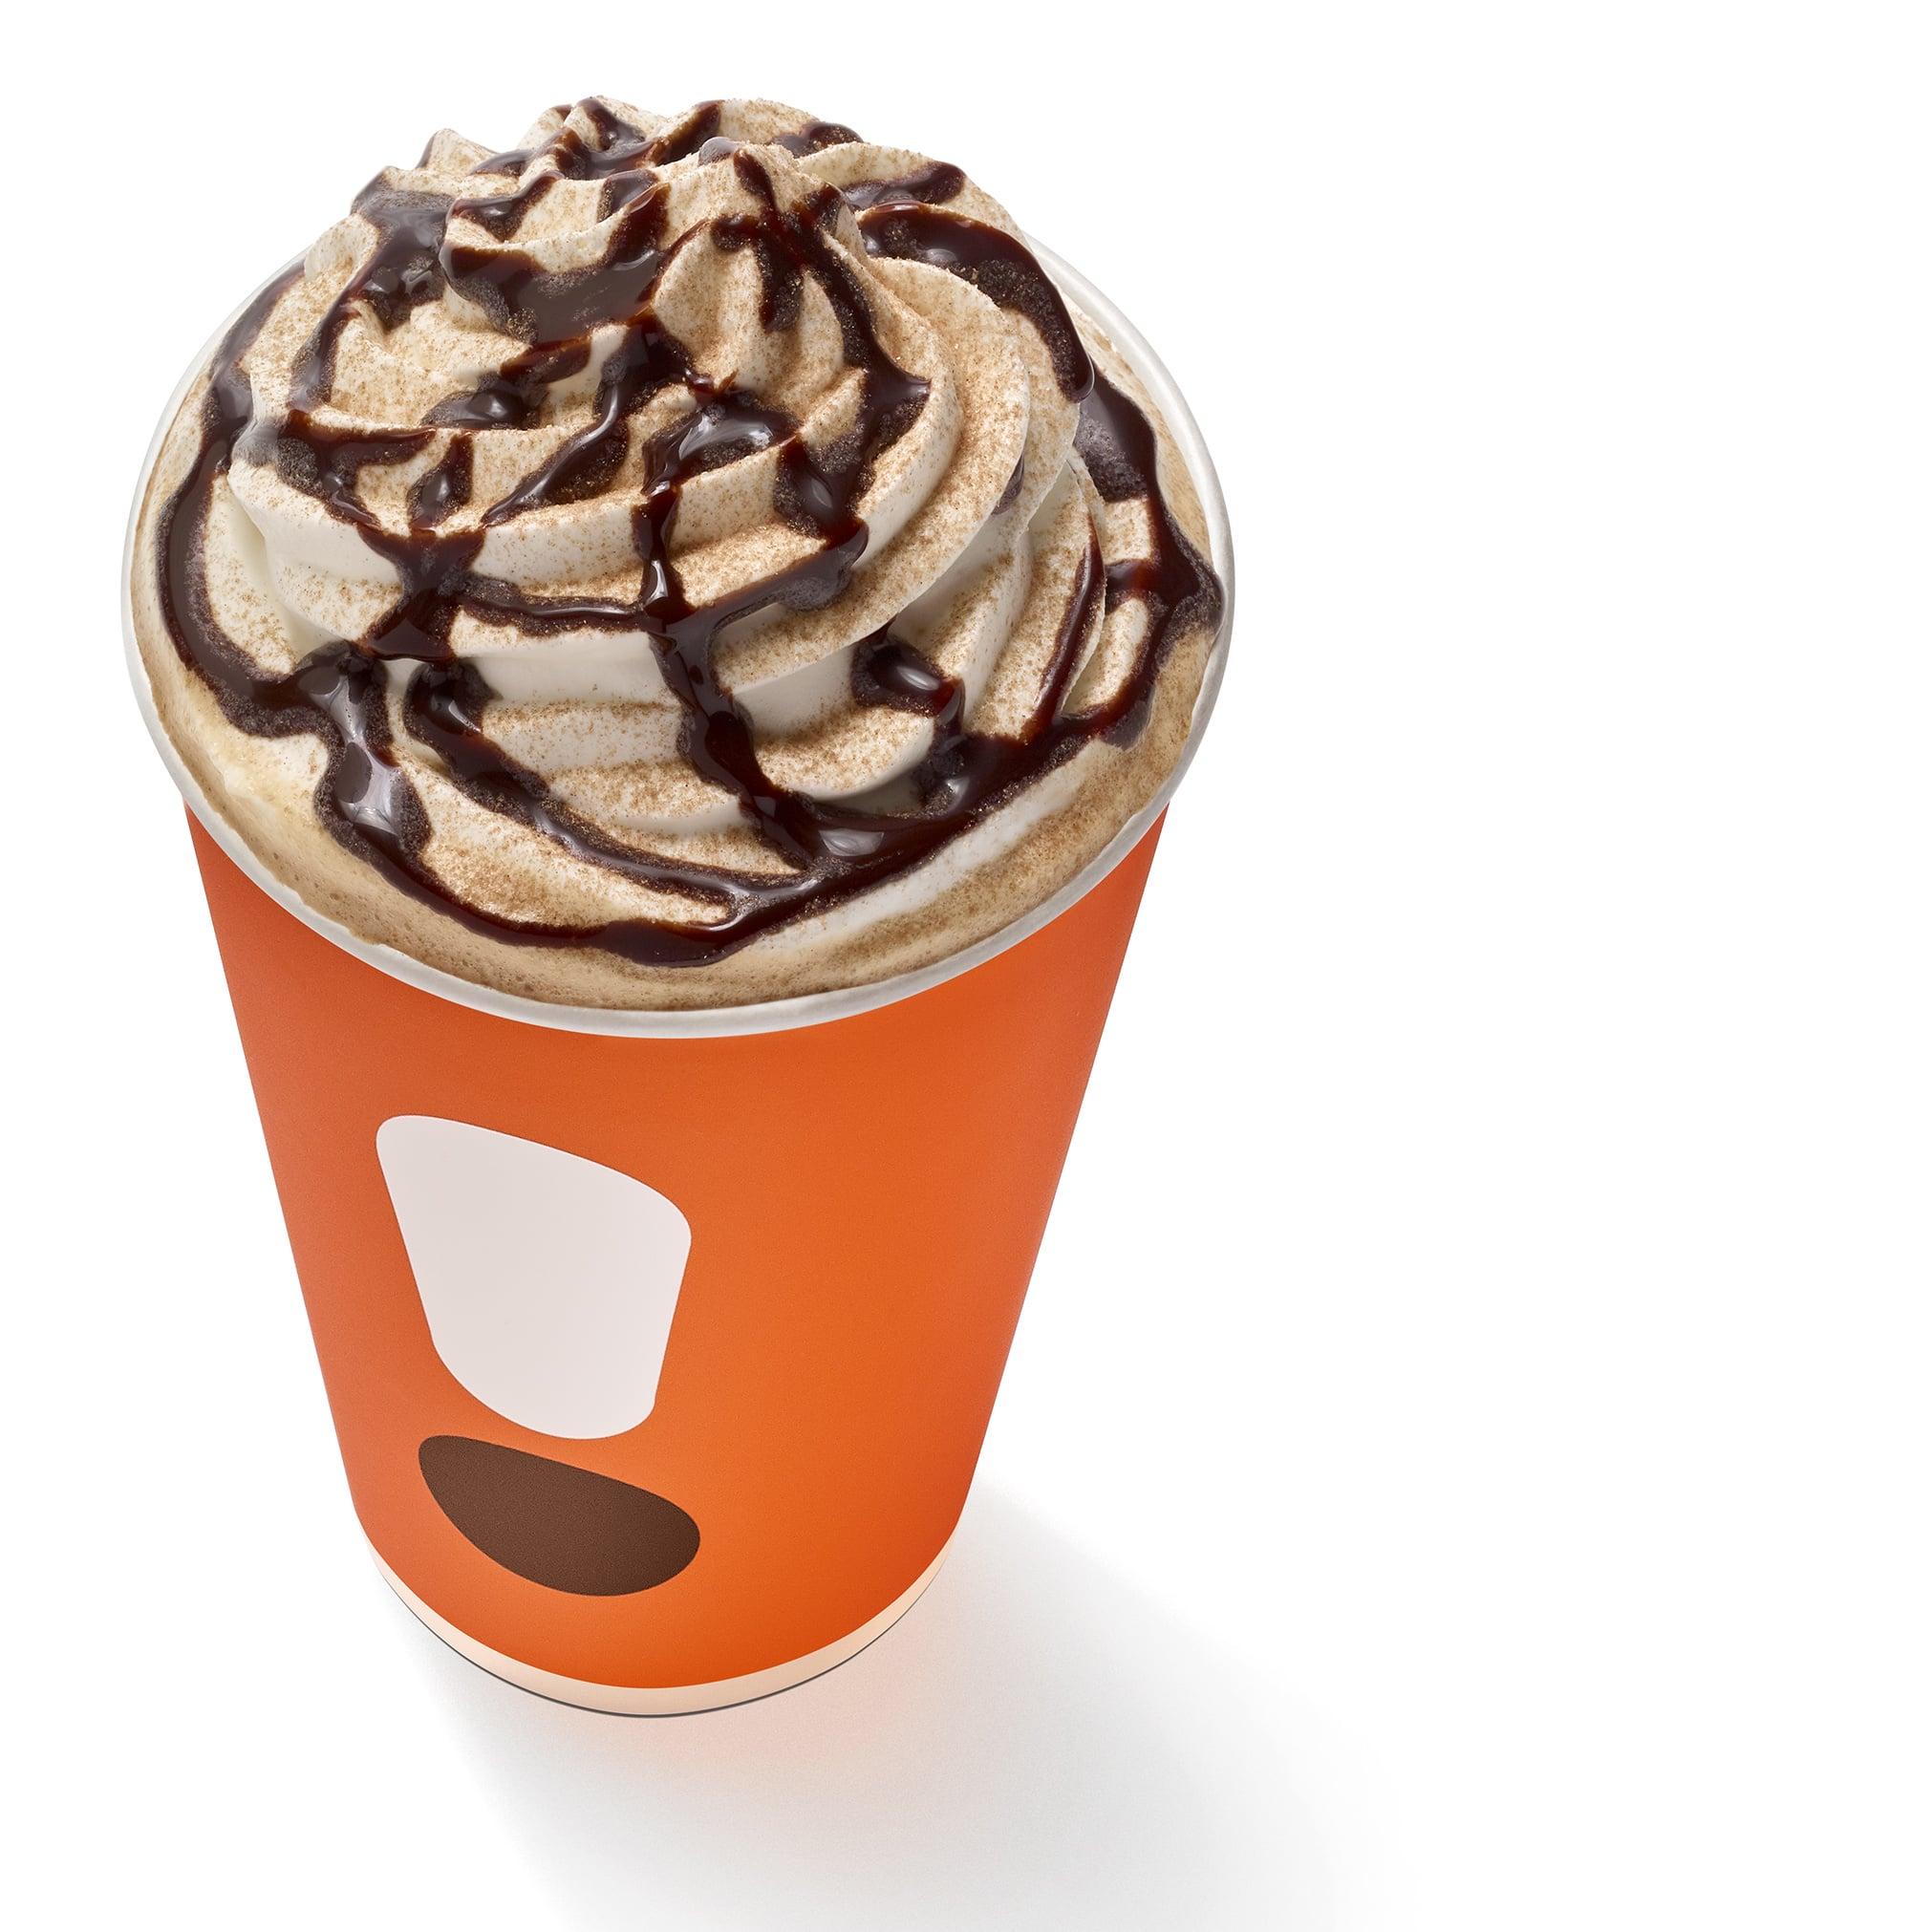 Iced Mocha Latte Dunkin Donuts Recipe